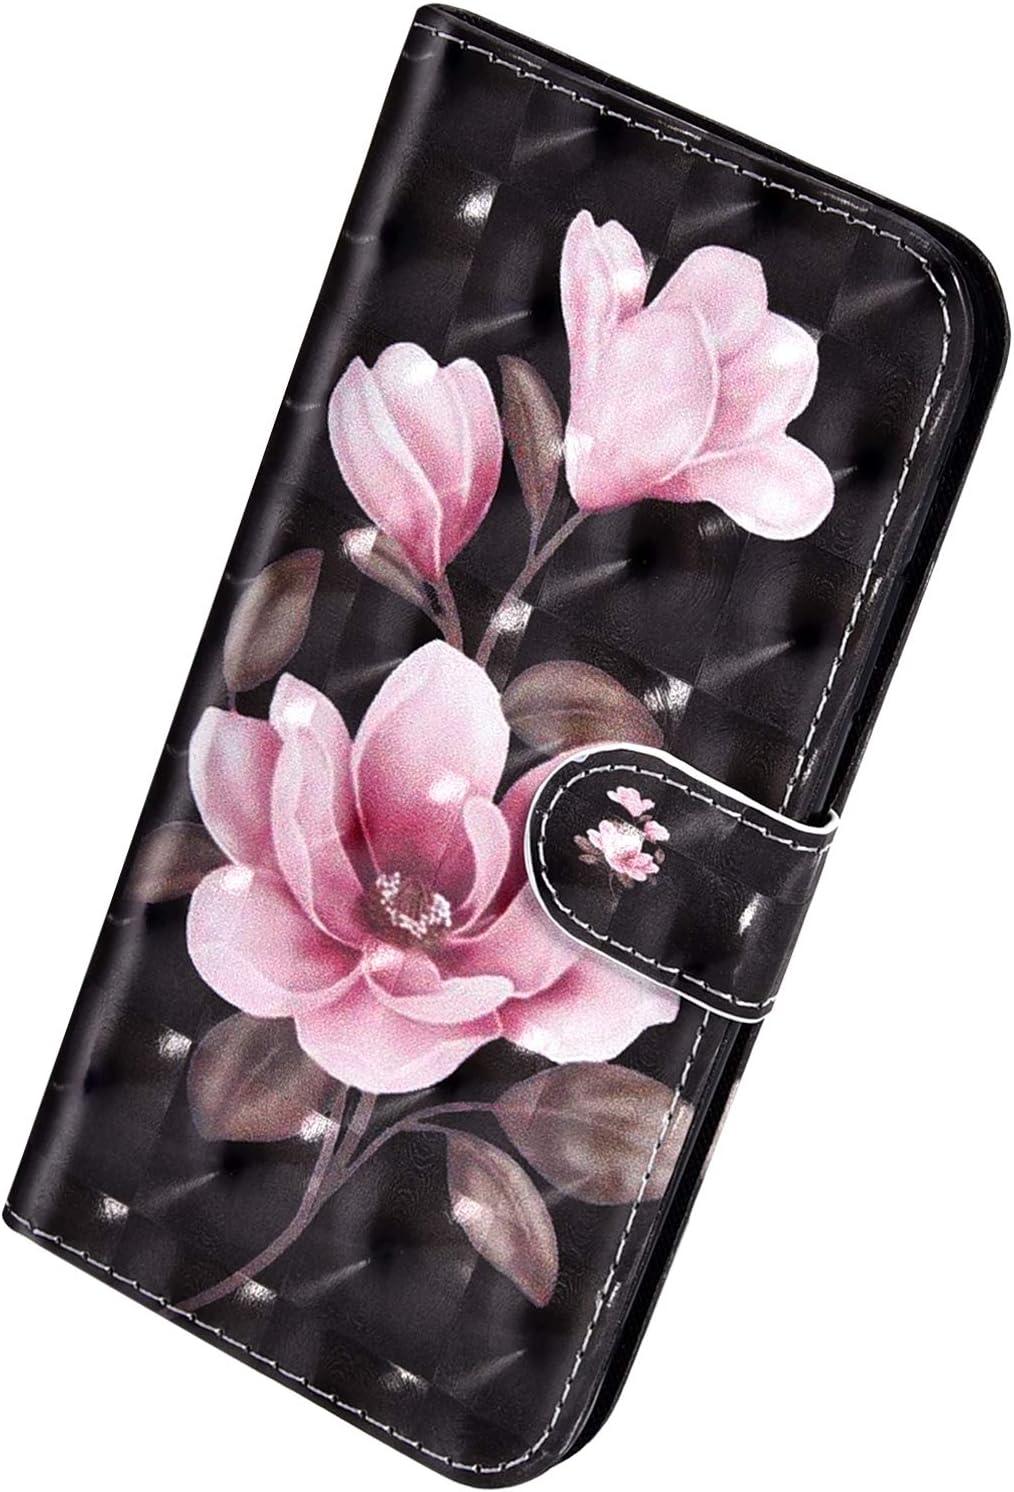 Herbests Kompatibel mit Xiaomi Redmi 6A Handyh/ülle H/ülle Flip Case Bunt Glitzer Muster Leder Schutzh/ülle Klappbar Bookstyle Lederh/ülle Ledertasche mit Magnet Kartenfach,Cool Panda